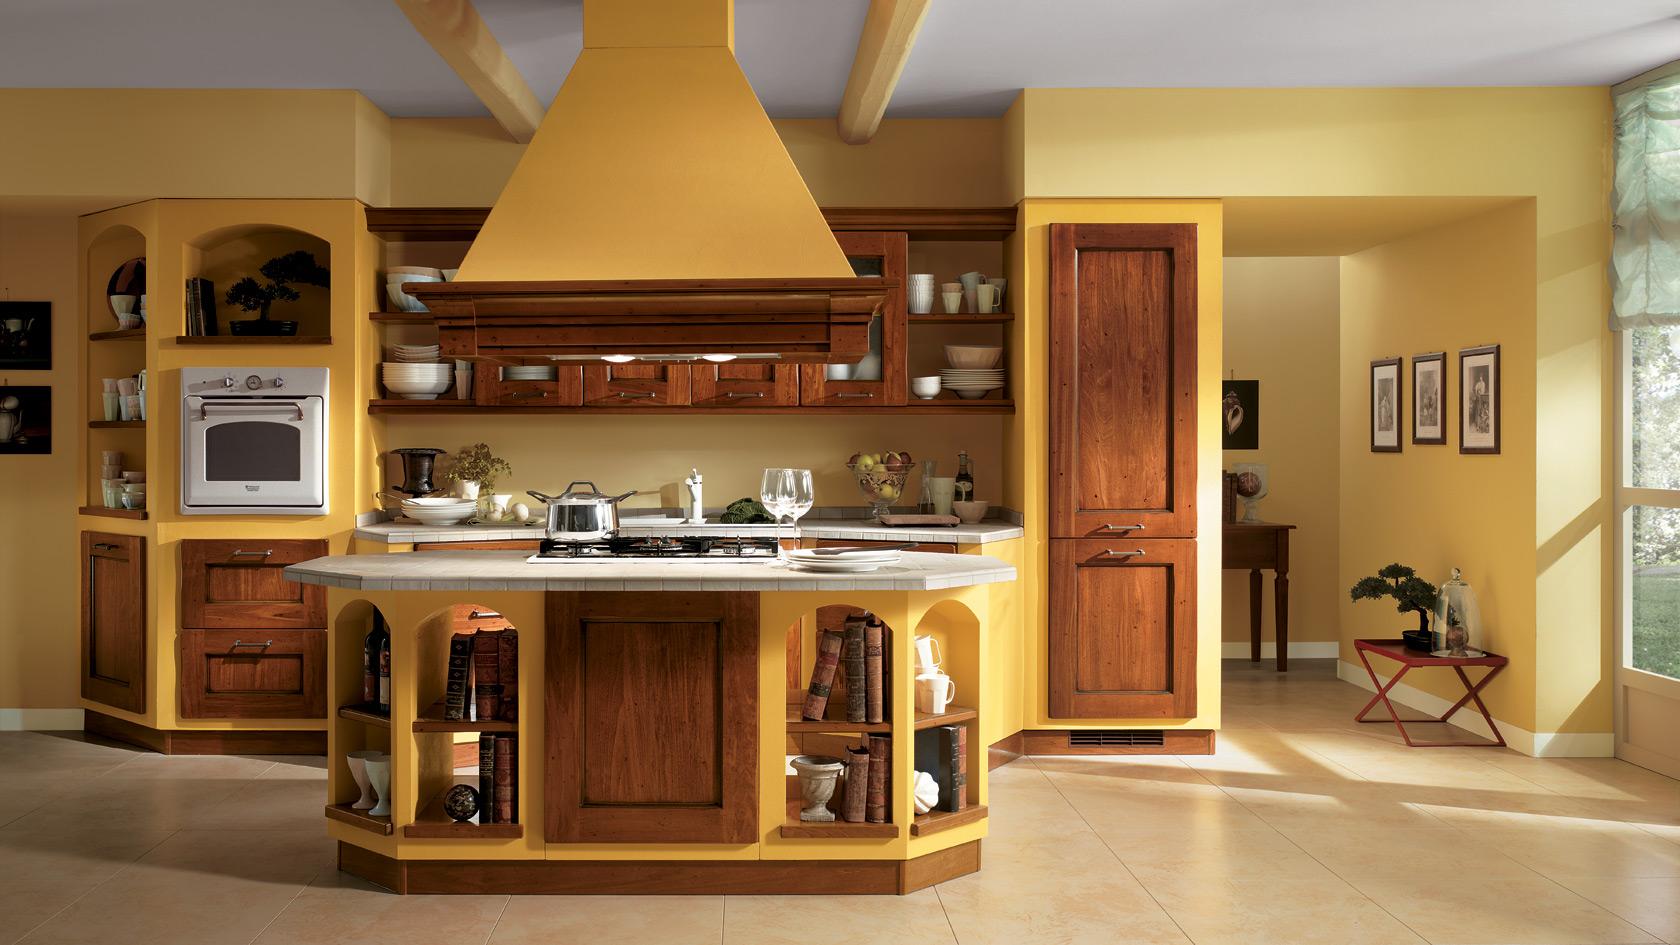 Cucina In Muratura Rustica Con Forno A Legna. Trendy Cucina In ...